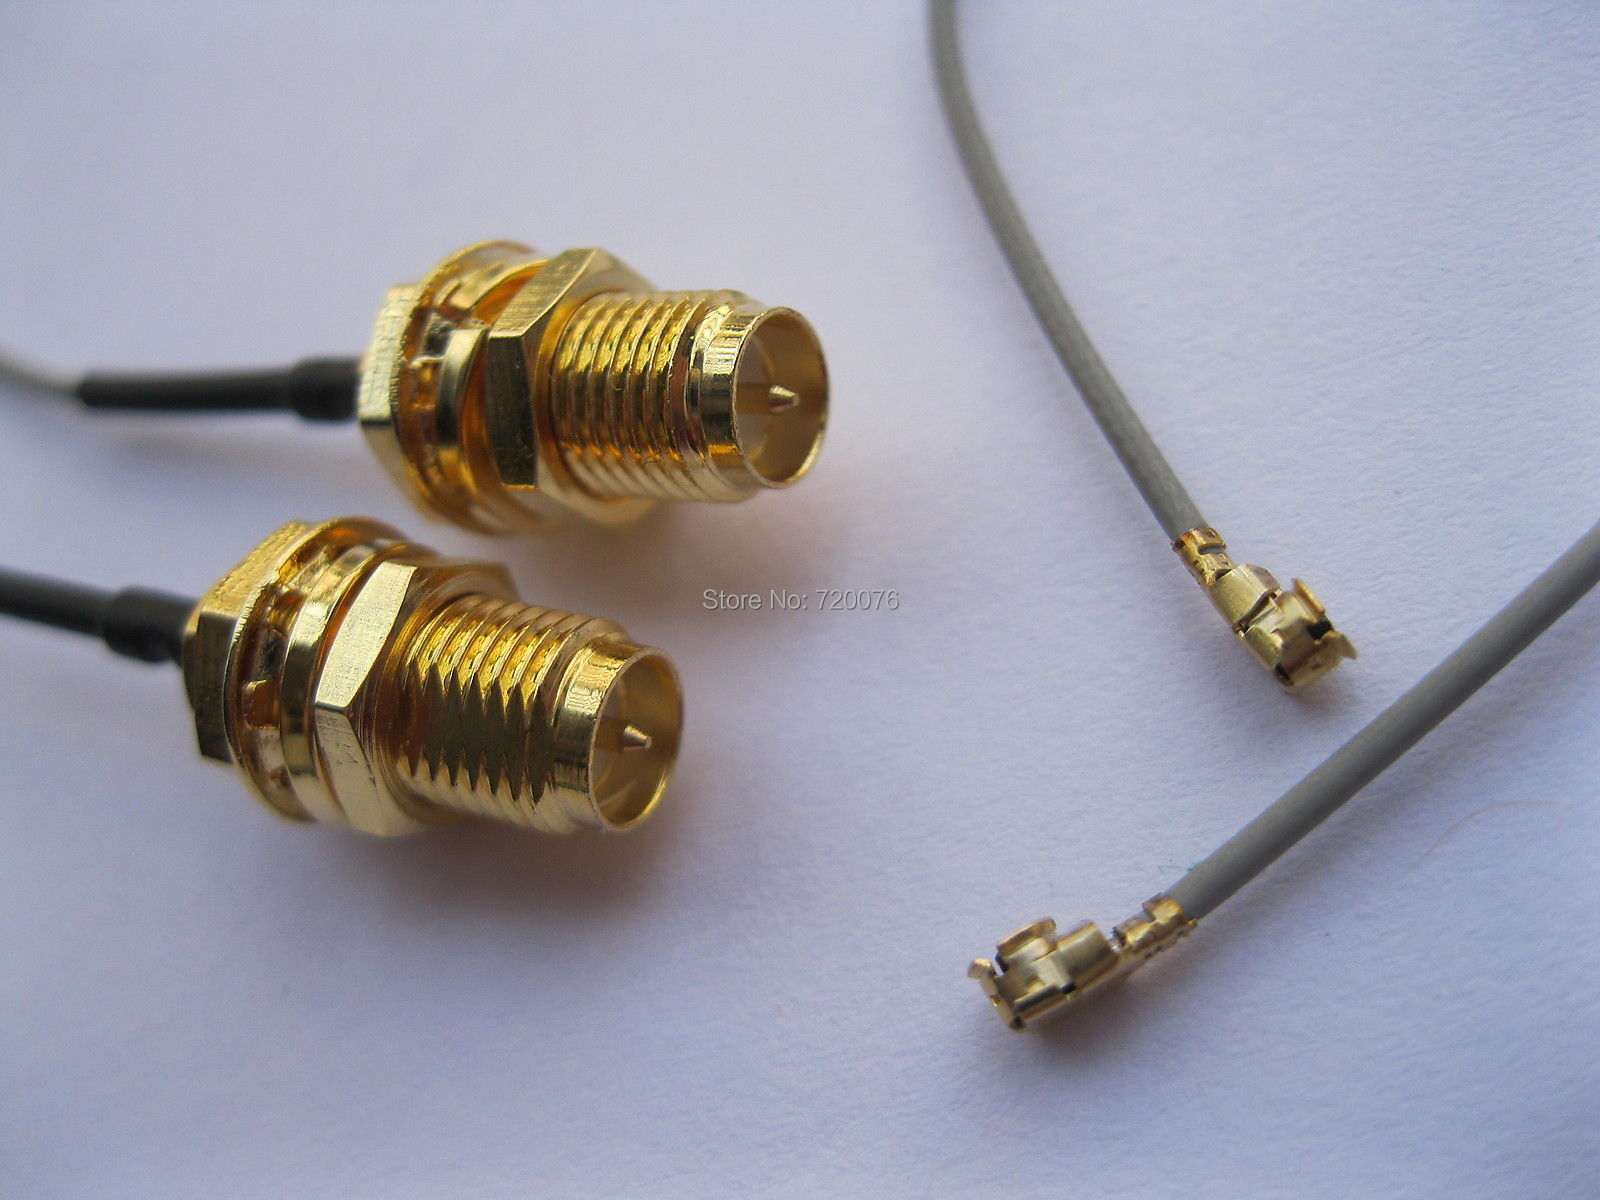 200 pcs RP-SMA Male Pin Connector to IPX U.FL 1.13 Antenna WiFi Cable 120mm freeshipping zigbee cc2530 module pcb antenna sma